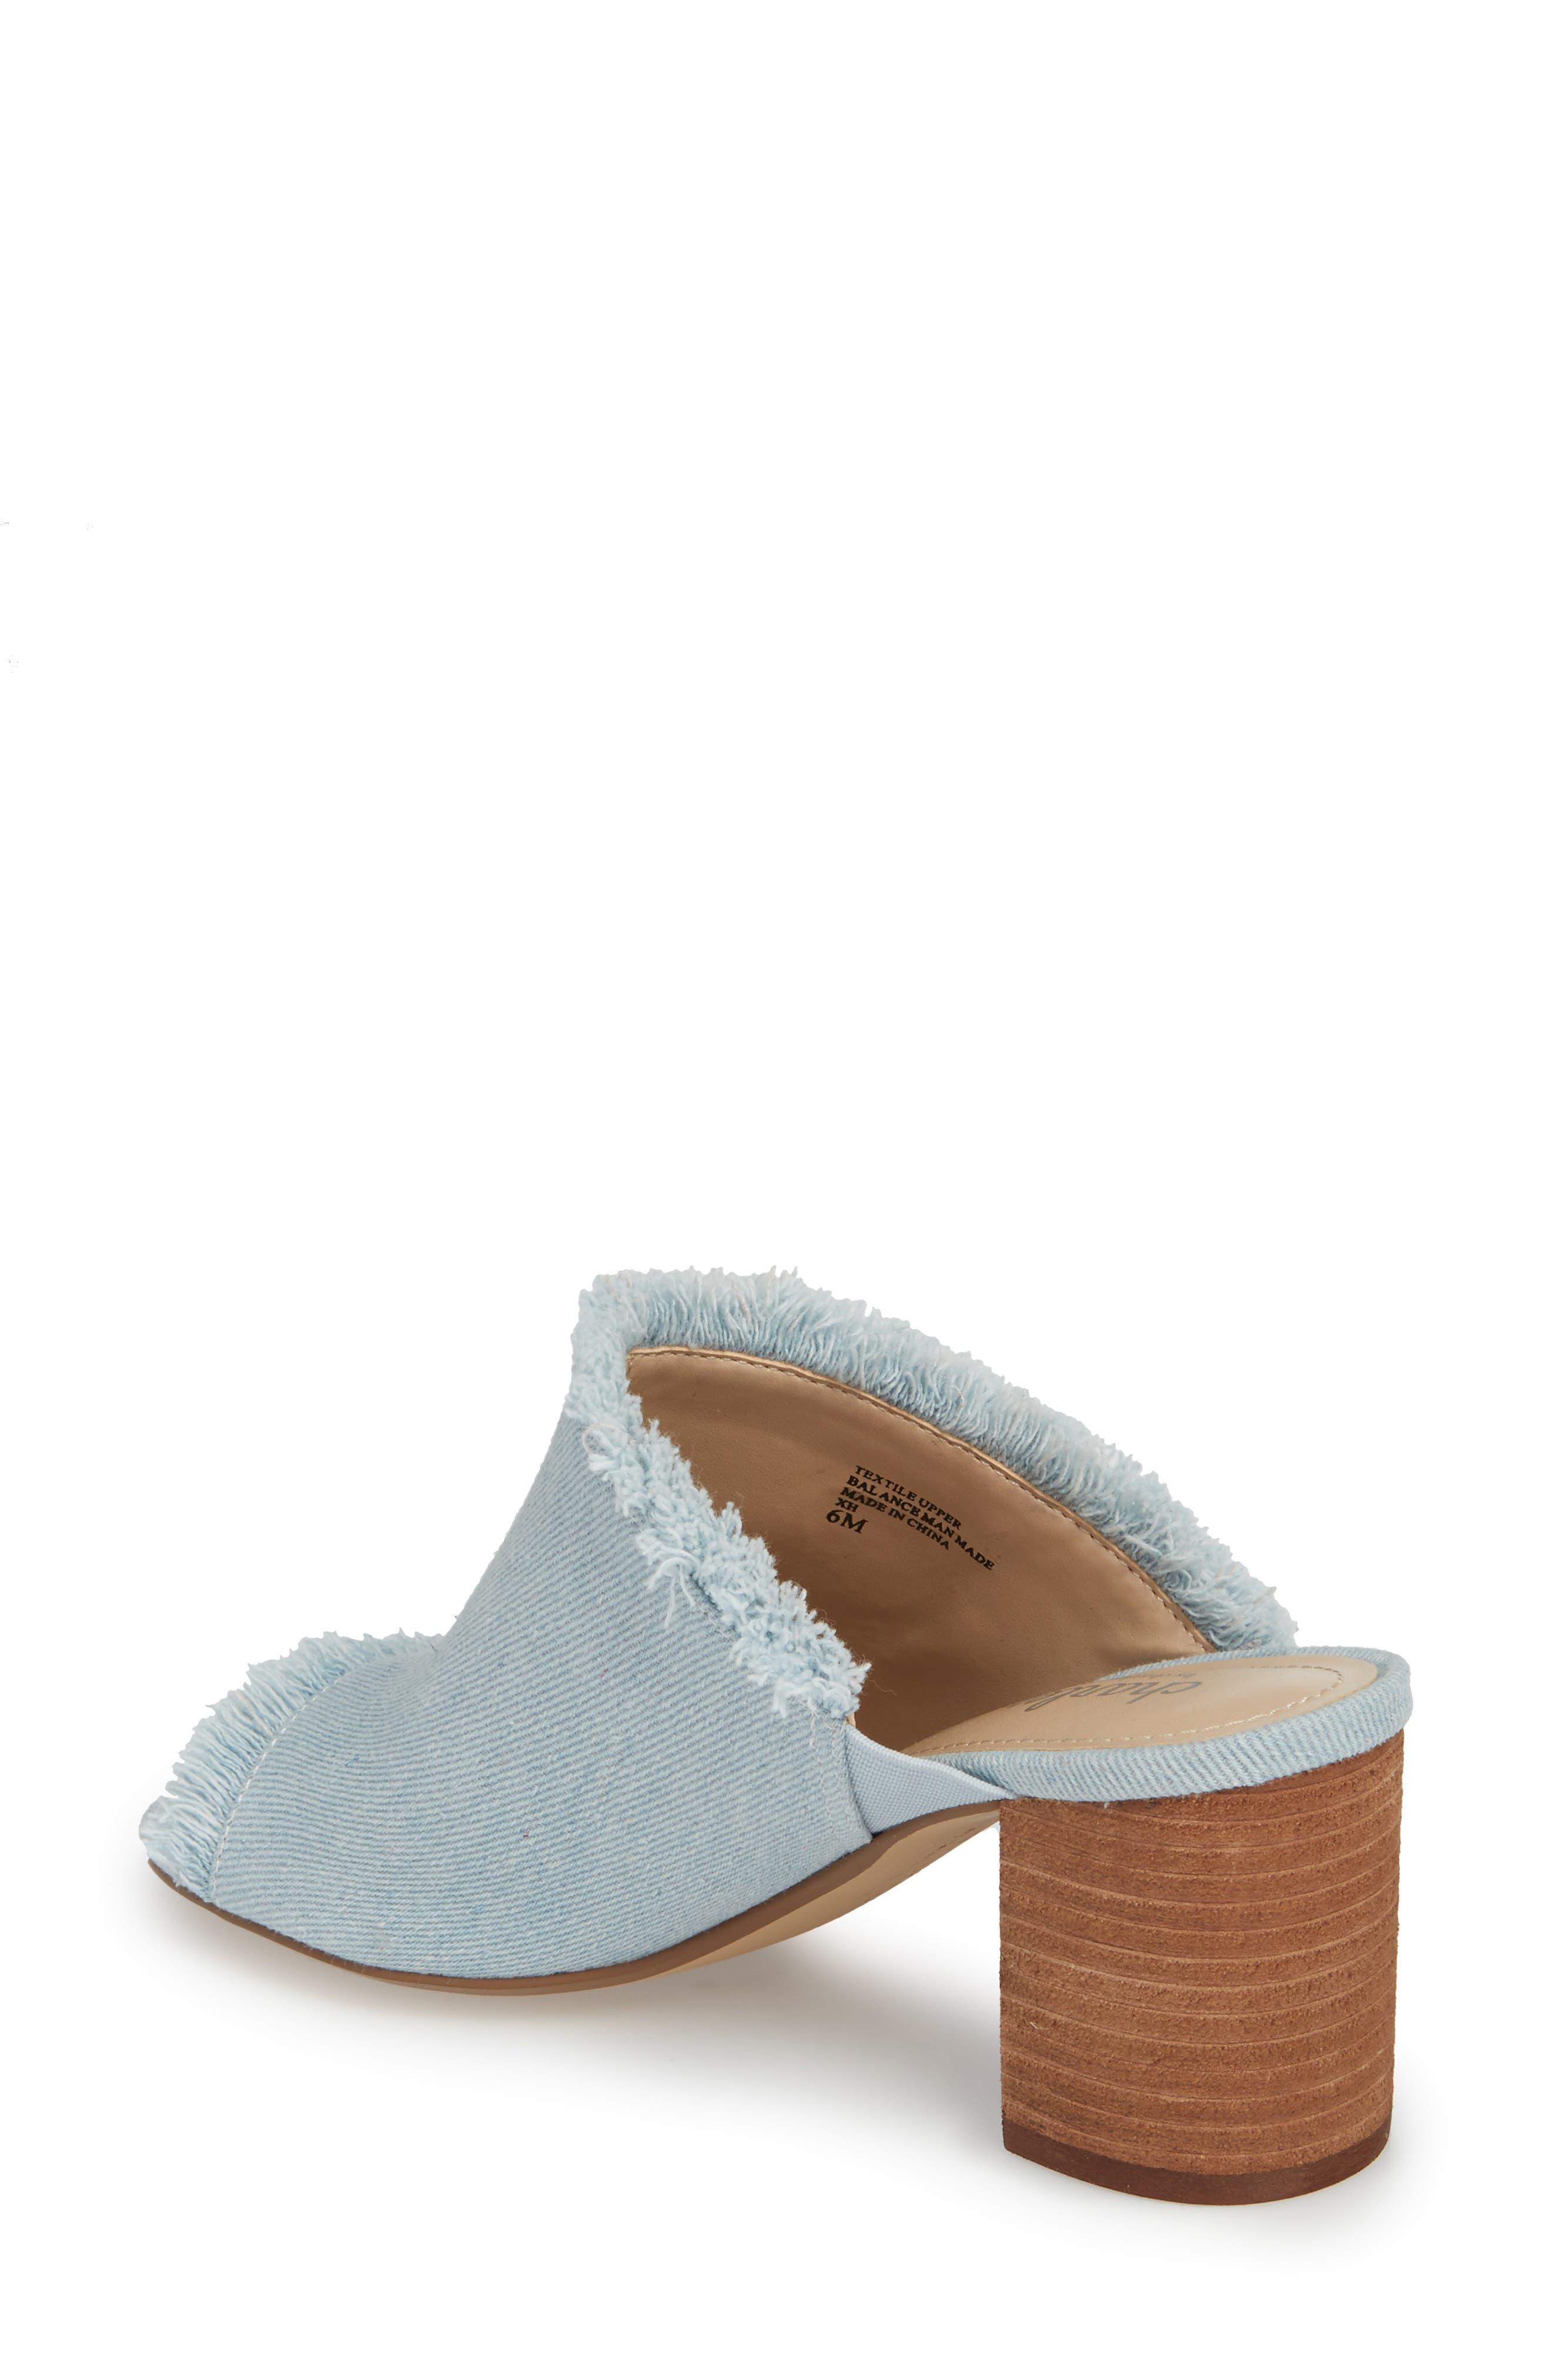 Kadia Fringed Mule Sandal,                             Alternate thumbnail 6, color,